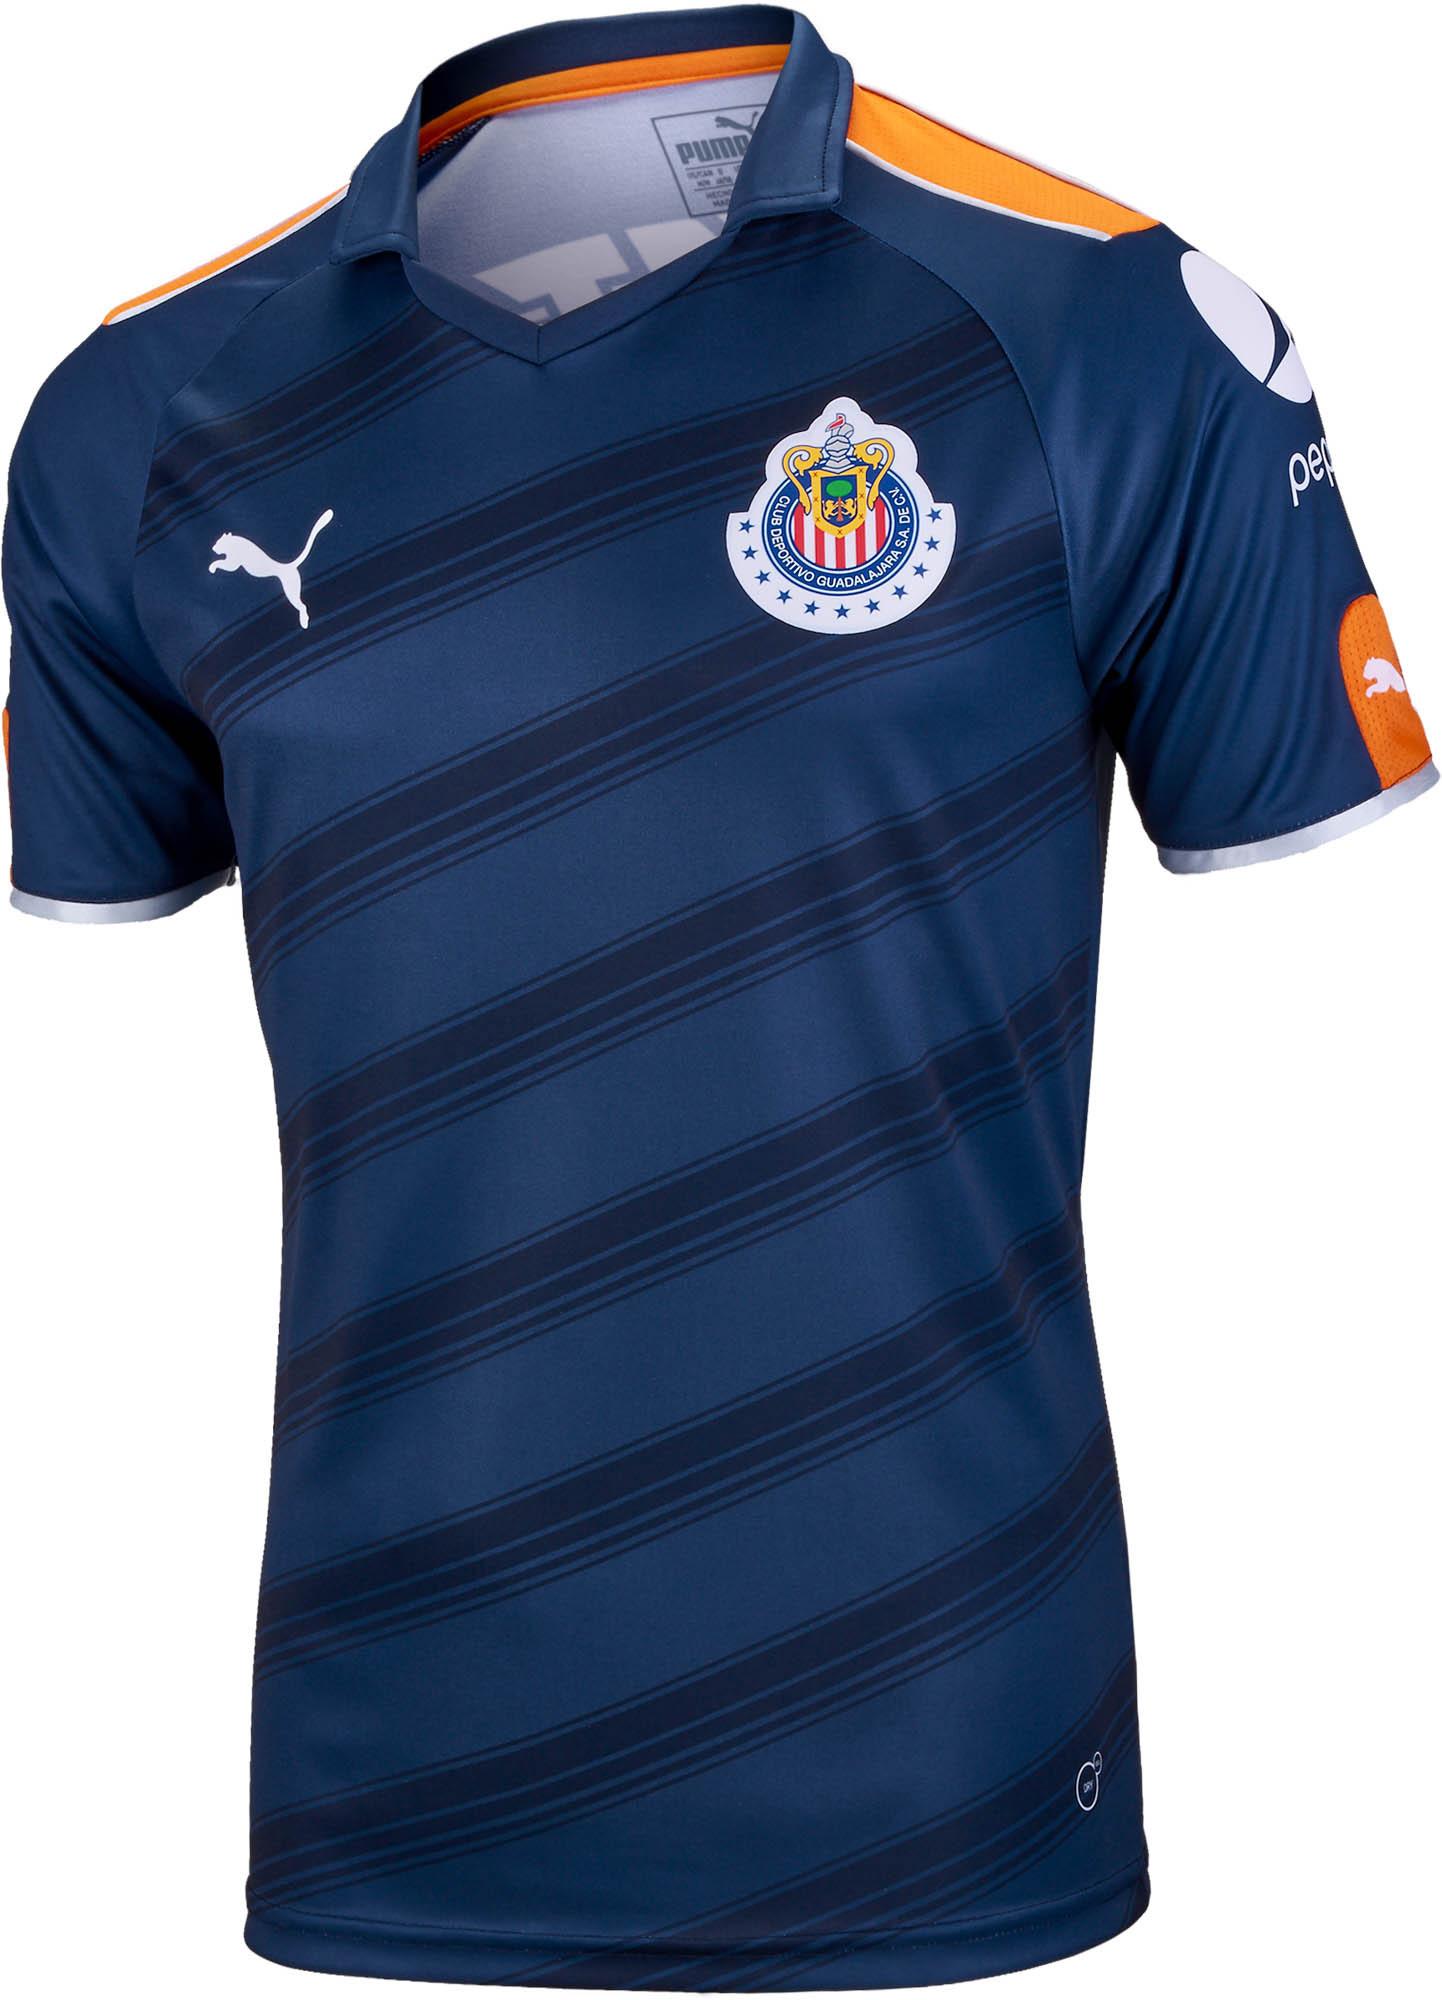 promo code 23a22 a1933 Puma Chivas 3rd Jersey 2016-17